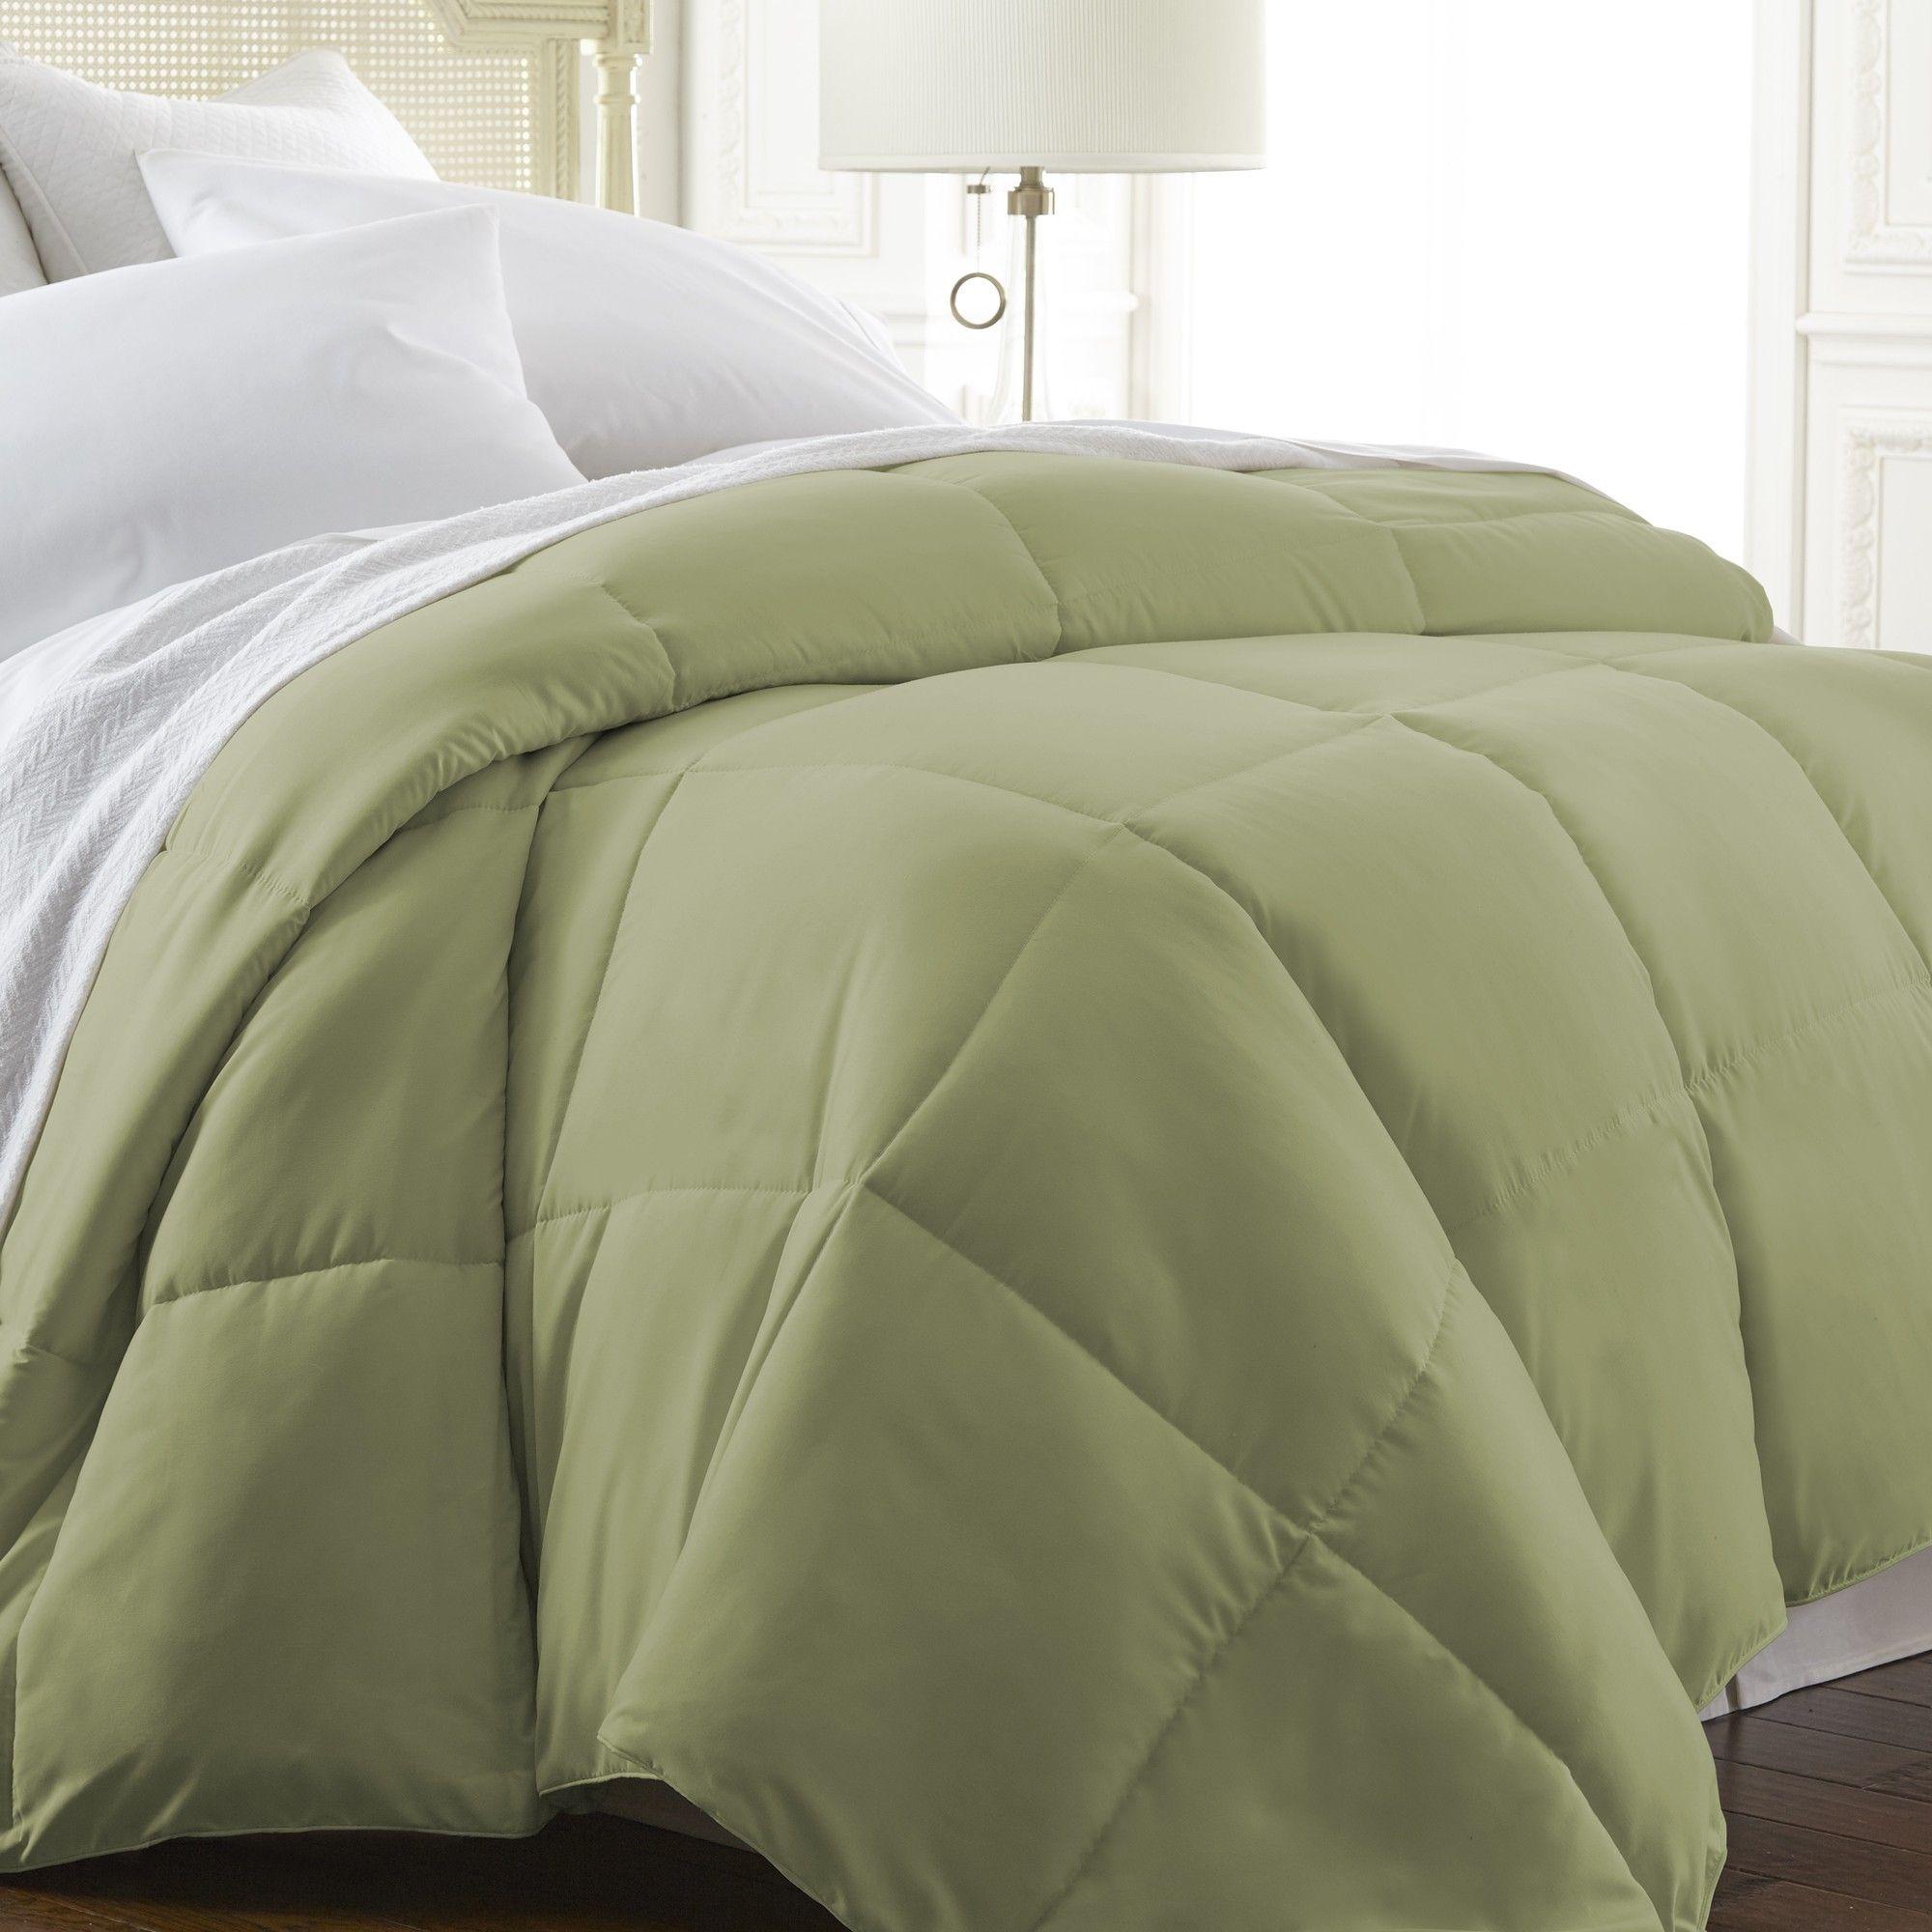 duvet everest insert supply alternative quilt product down